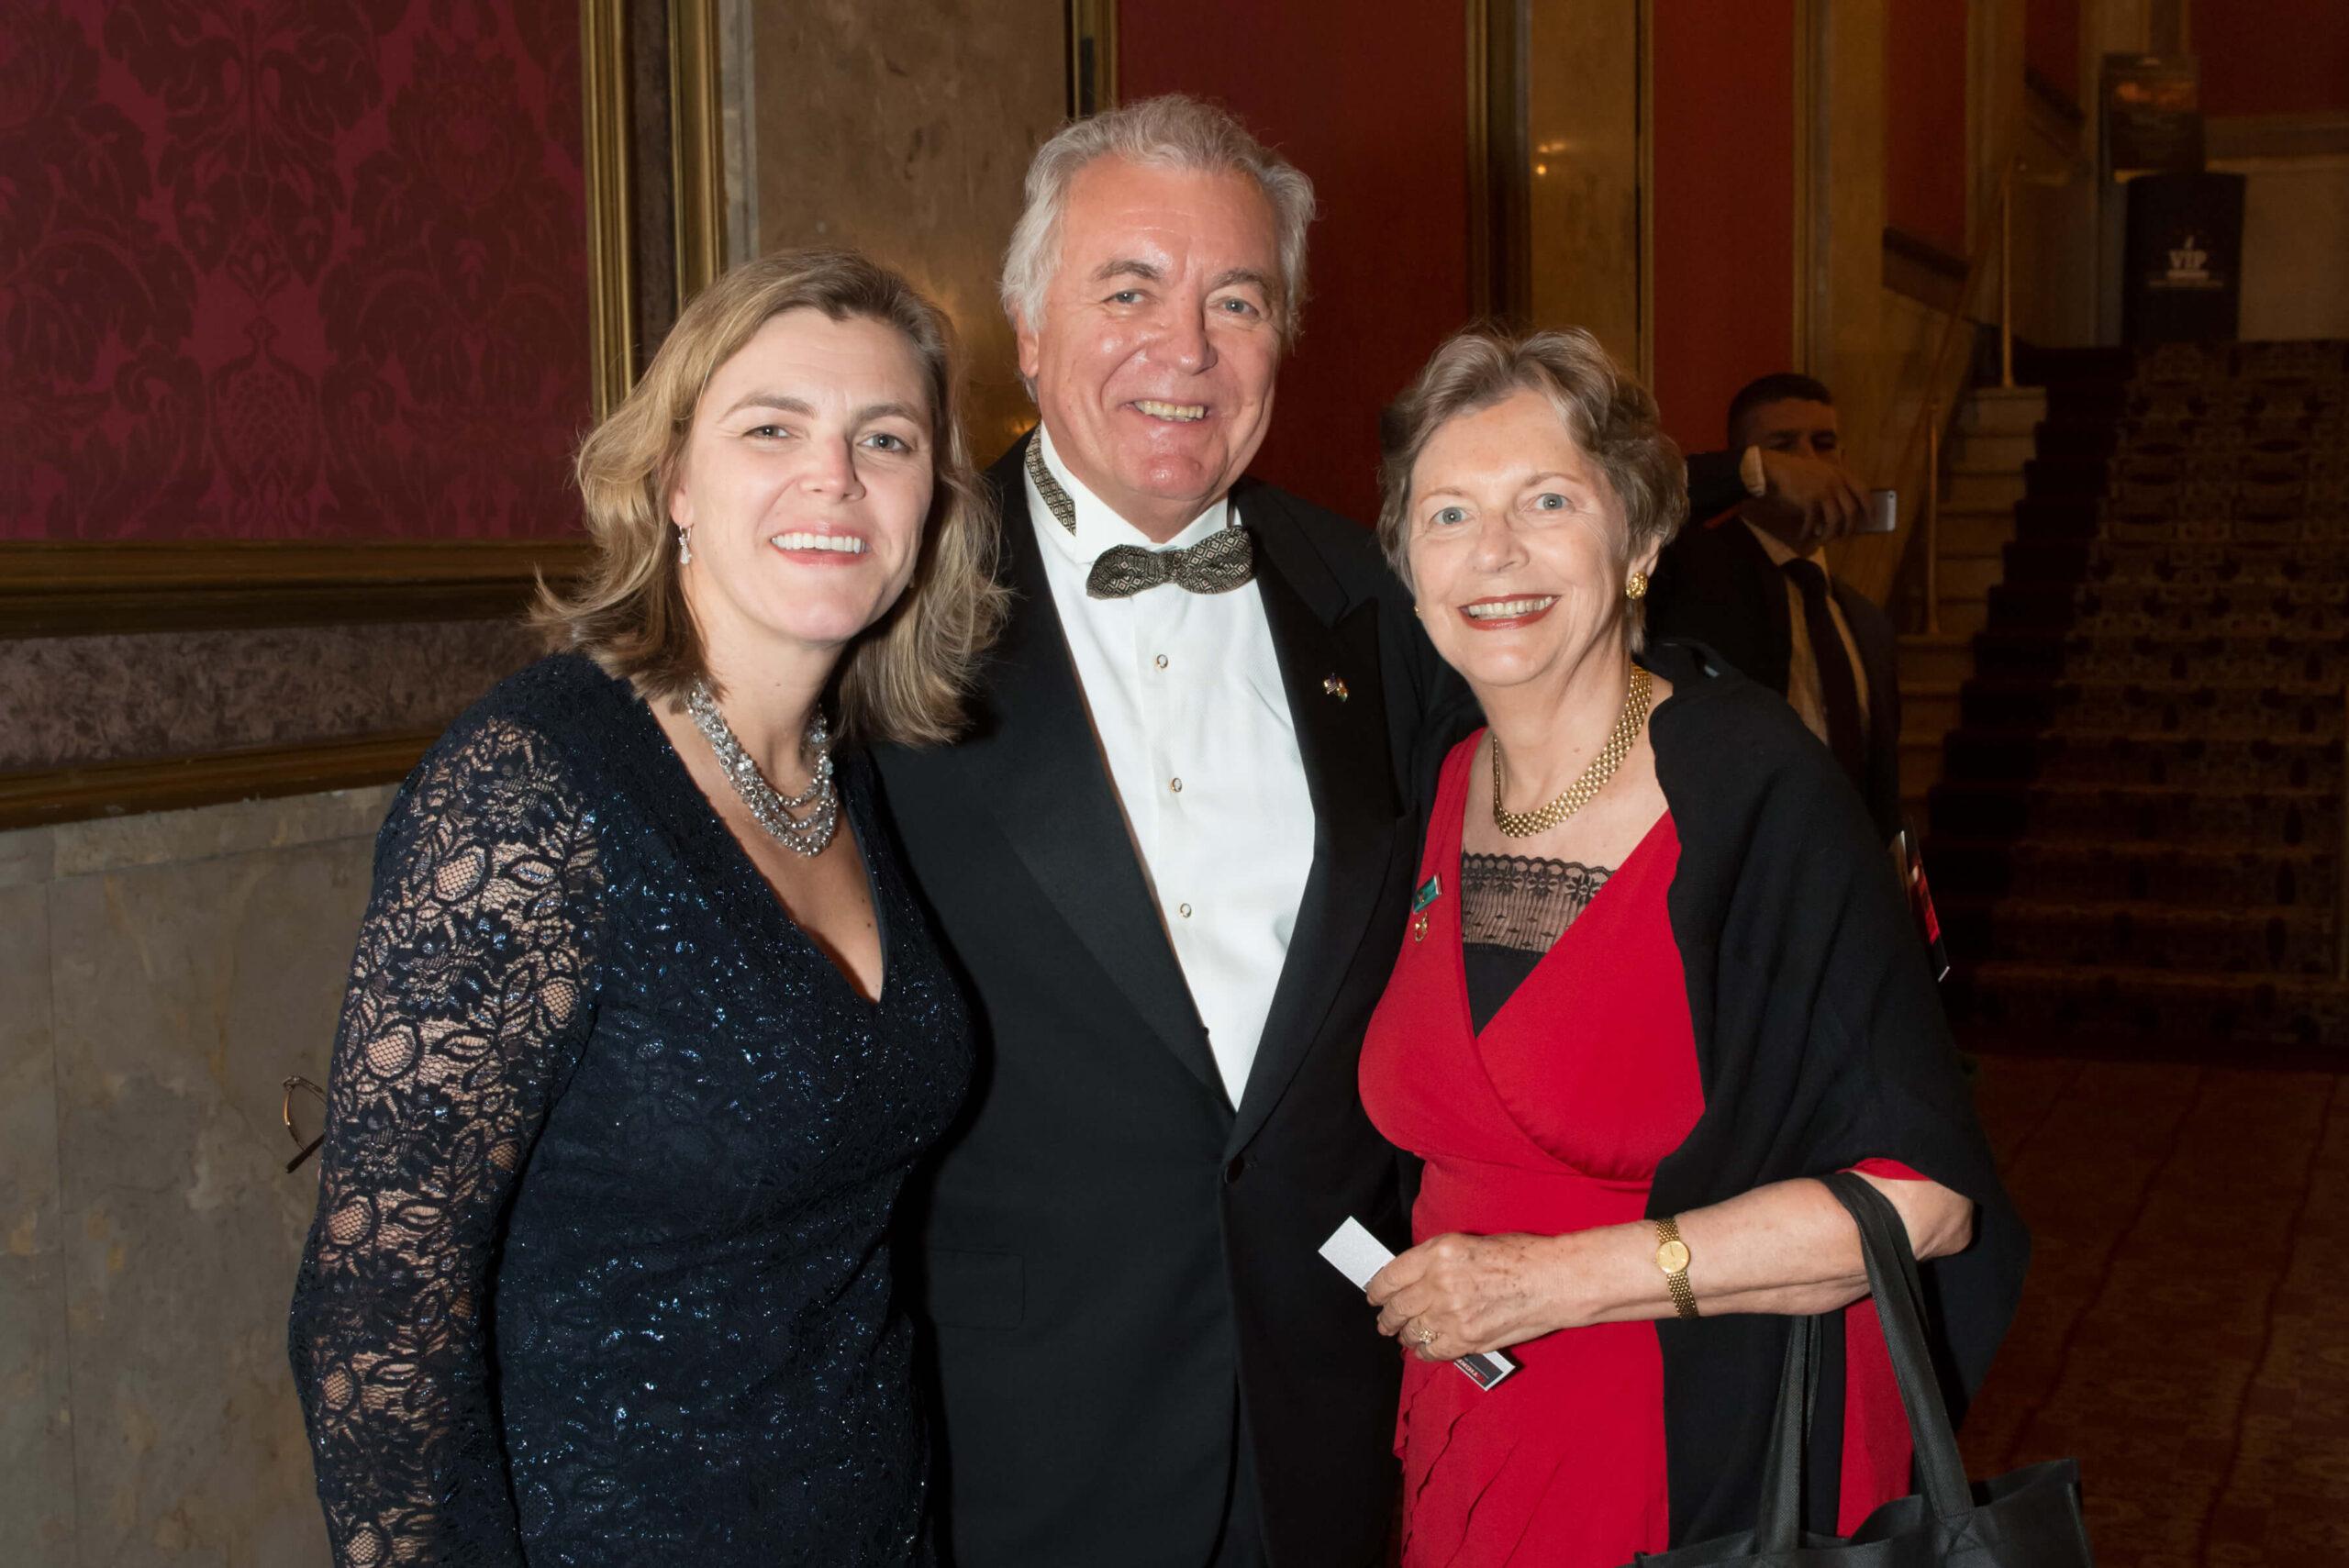 Mrs. Andrea Lauer Rice, Mr. John N. Lauer, Mrs. Edith K. Lauer